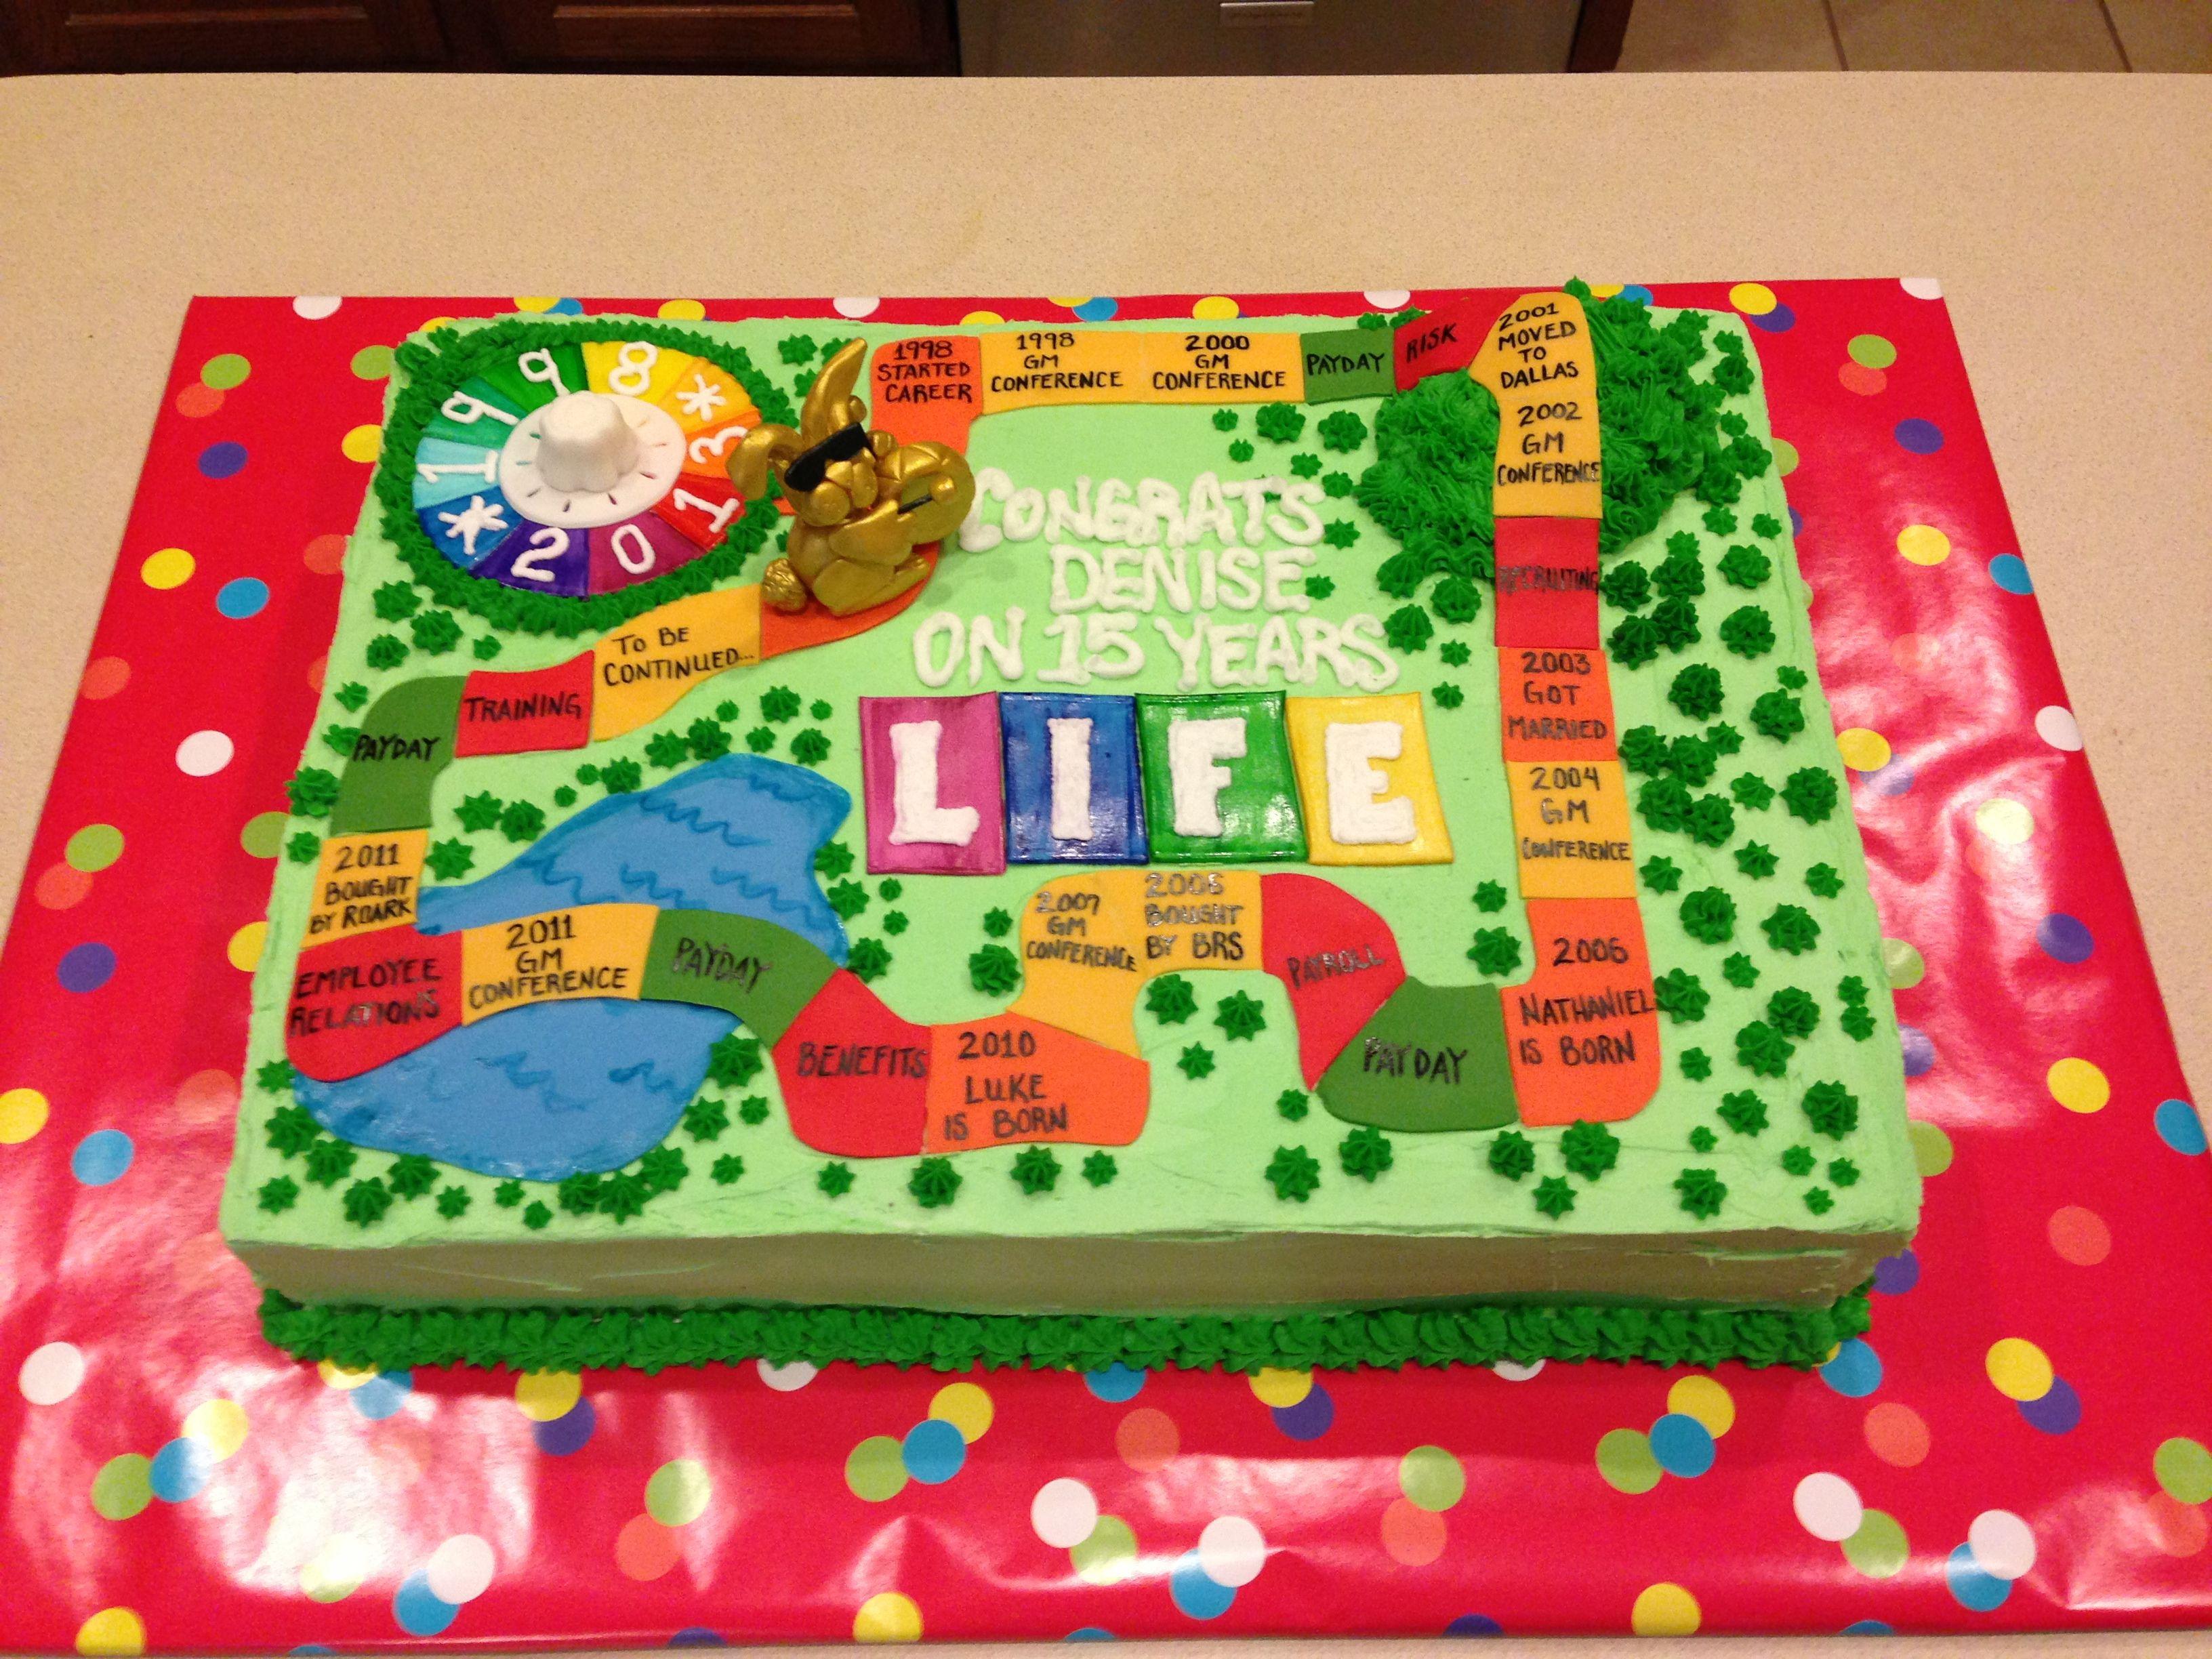 Game Of Life Cake Amazing Cakes Pinterest Gaming Cake And